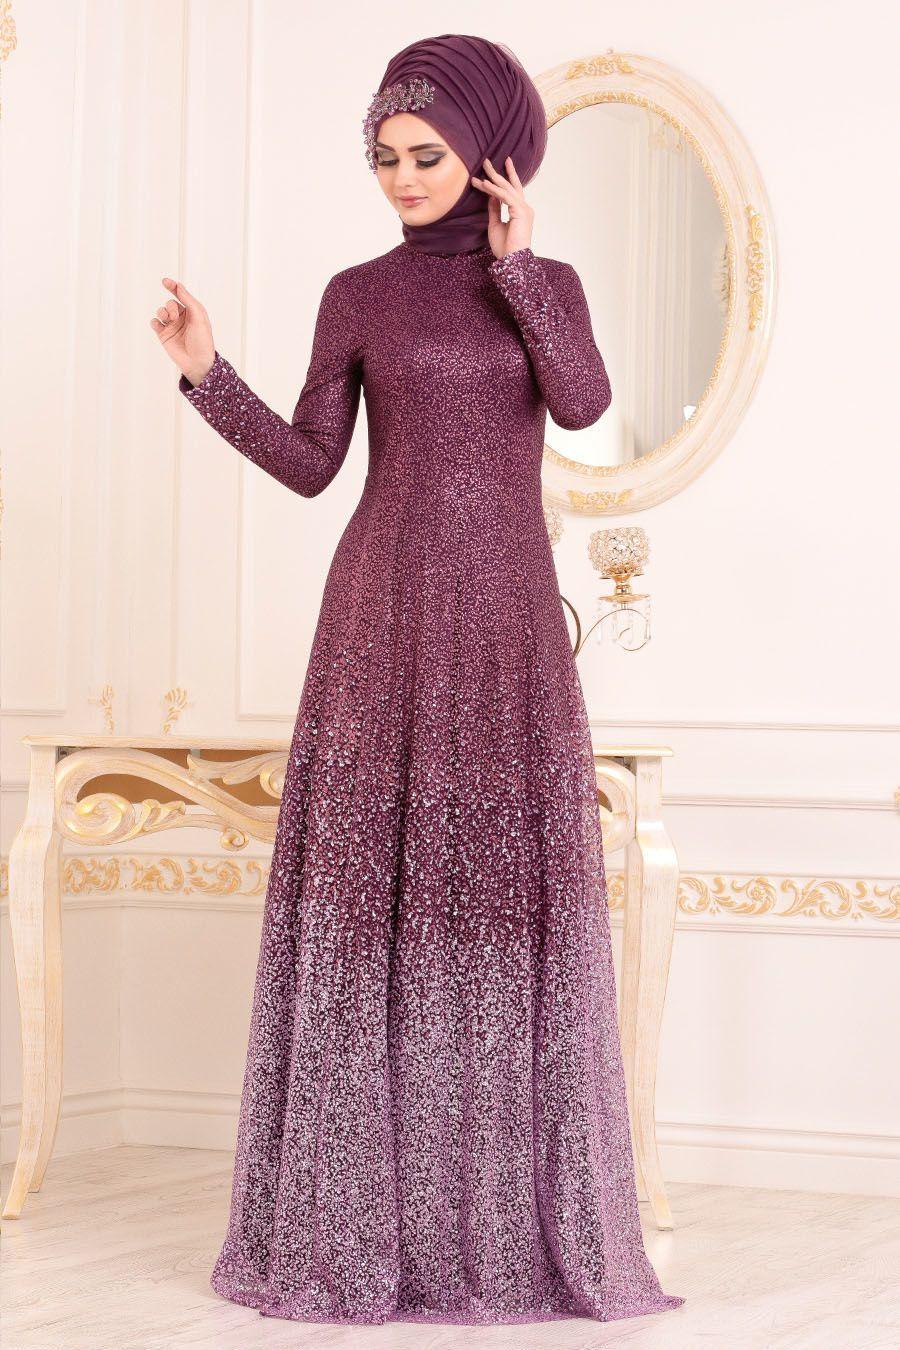 Tesetturlu Abiye Elbise Simli Murdum Tesettur Abiye Elbise 2081mu Tesetturisland Com In 2020 Muslim Fashion Dress Stylish Dress Designs Muslimah Fashion Outfits